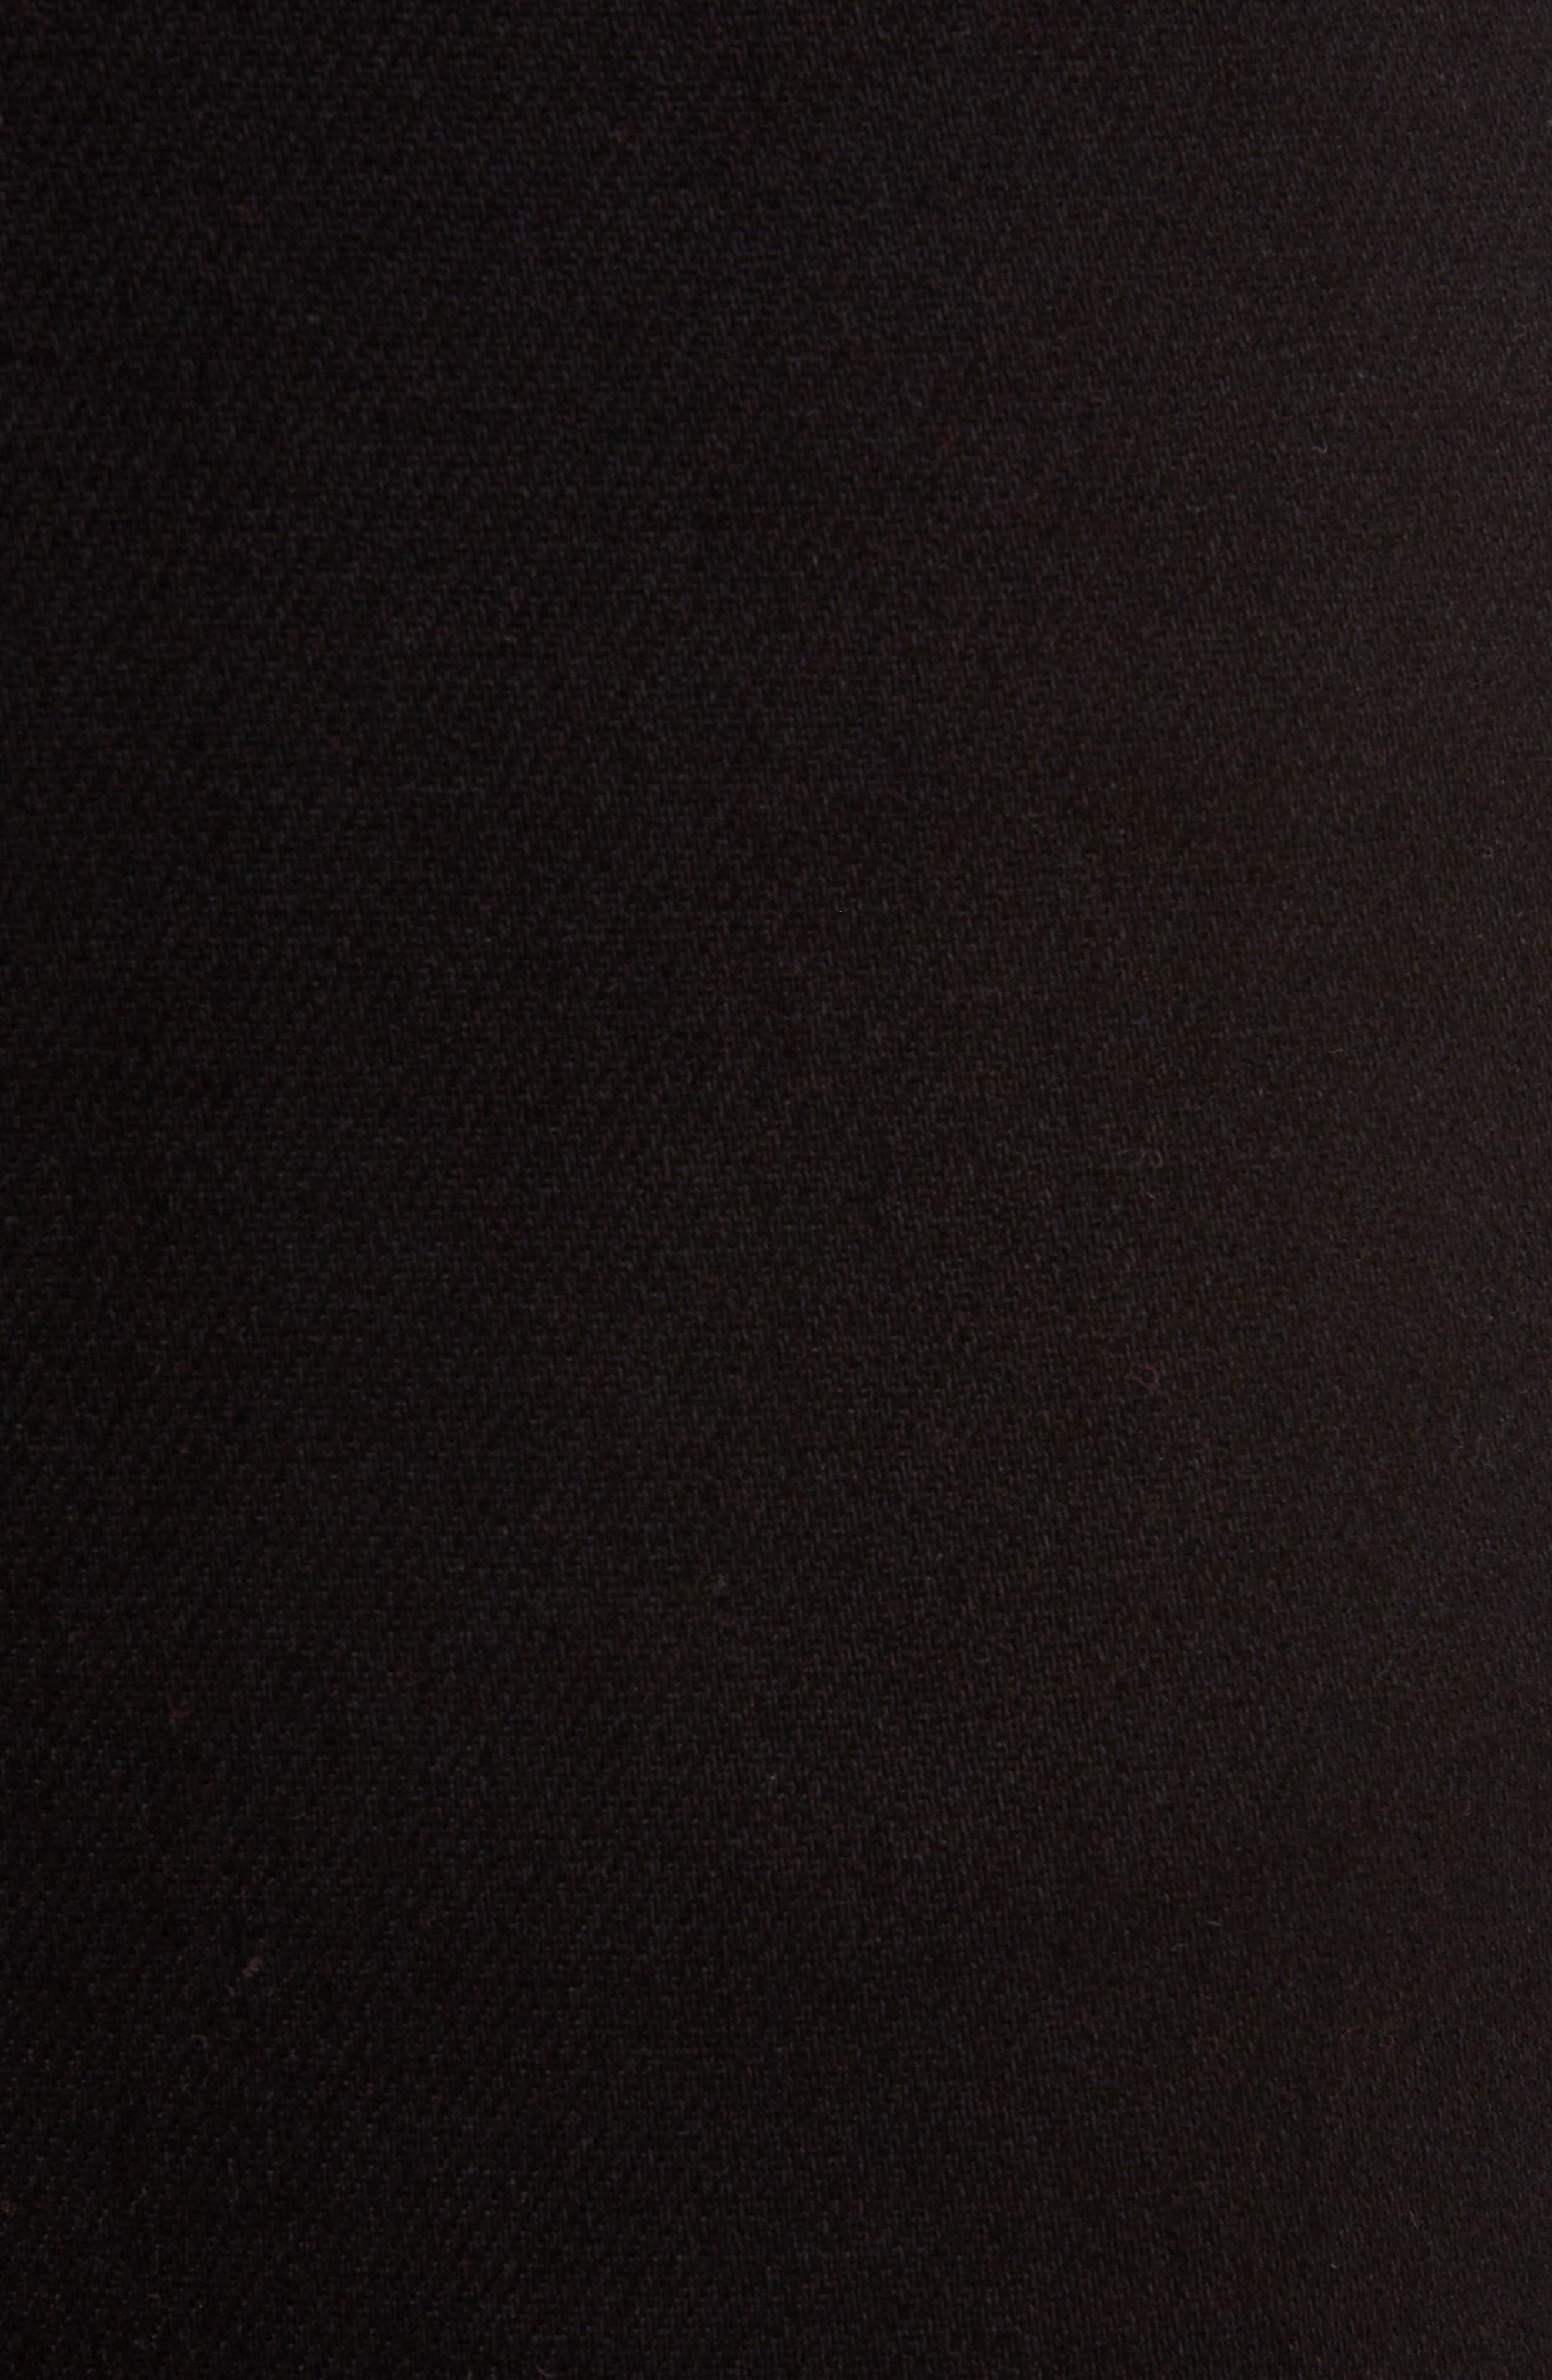 Peg High Waist Skinny Jeans,                             Alternate thumbnail 5, color,                             BLACK